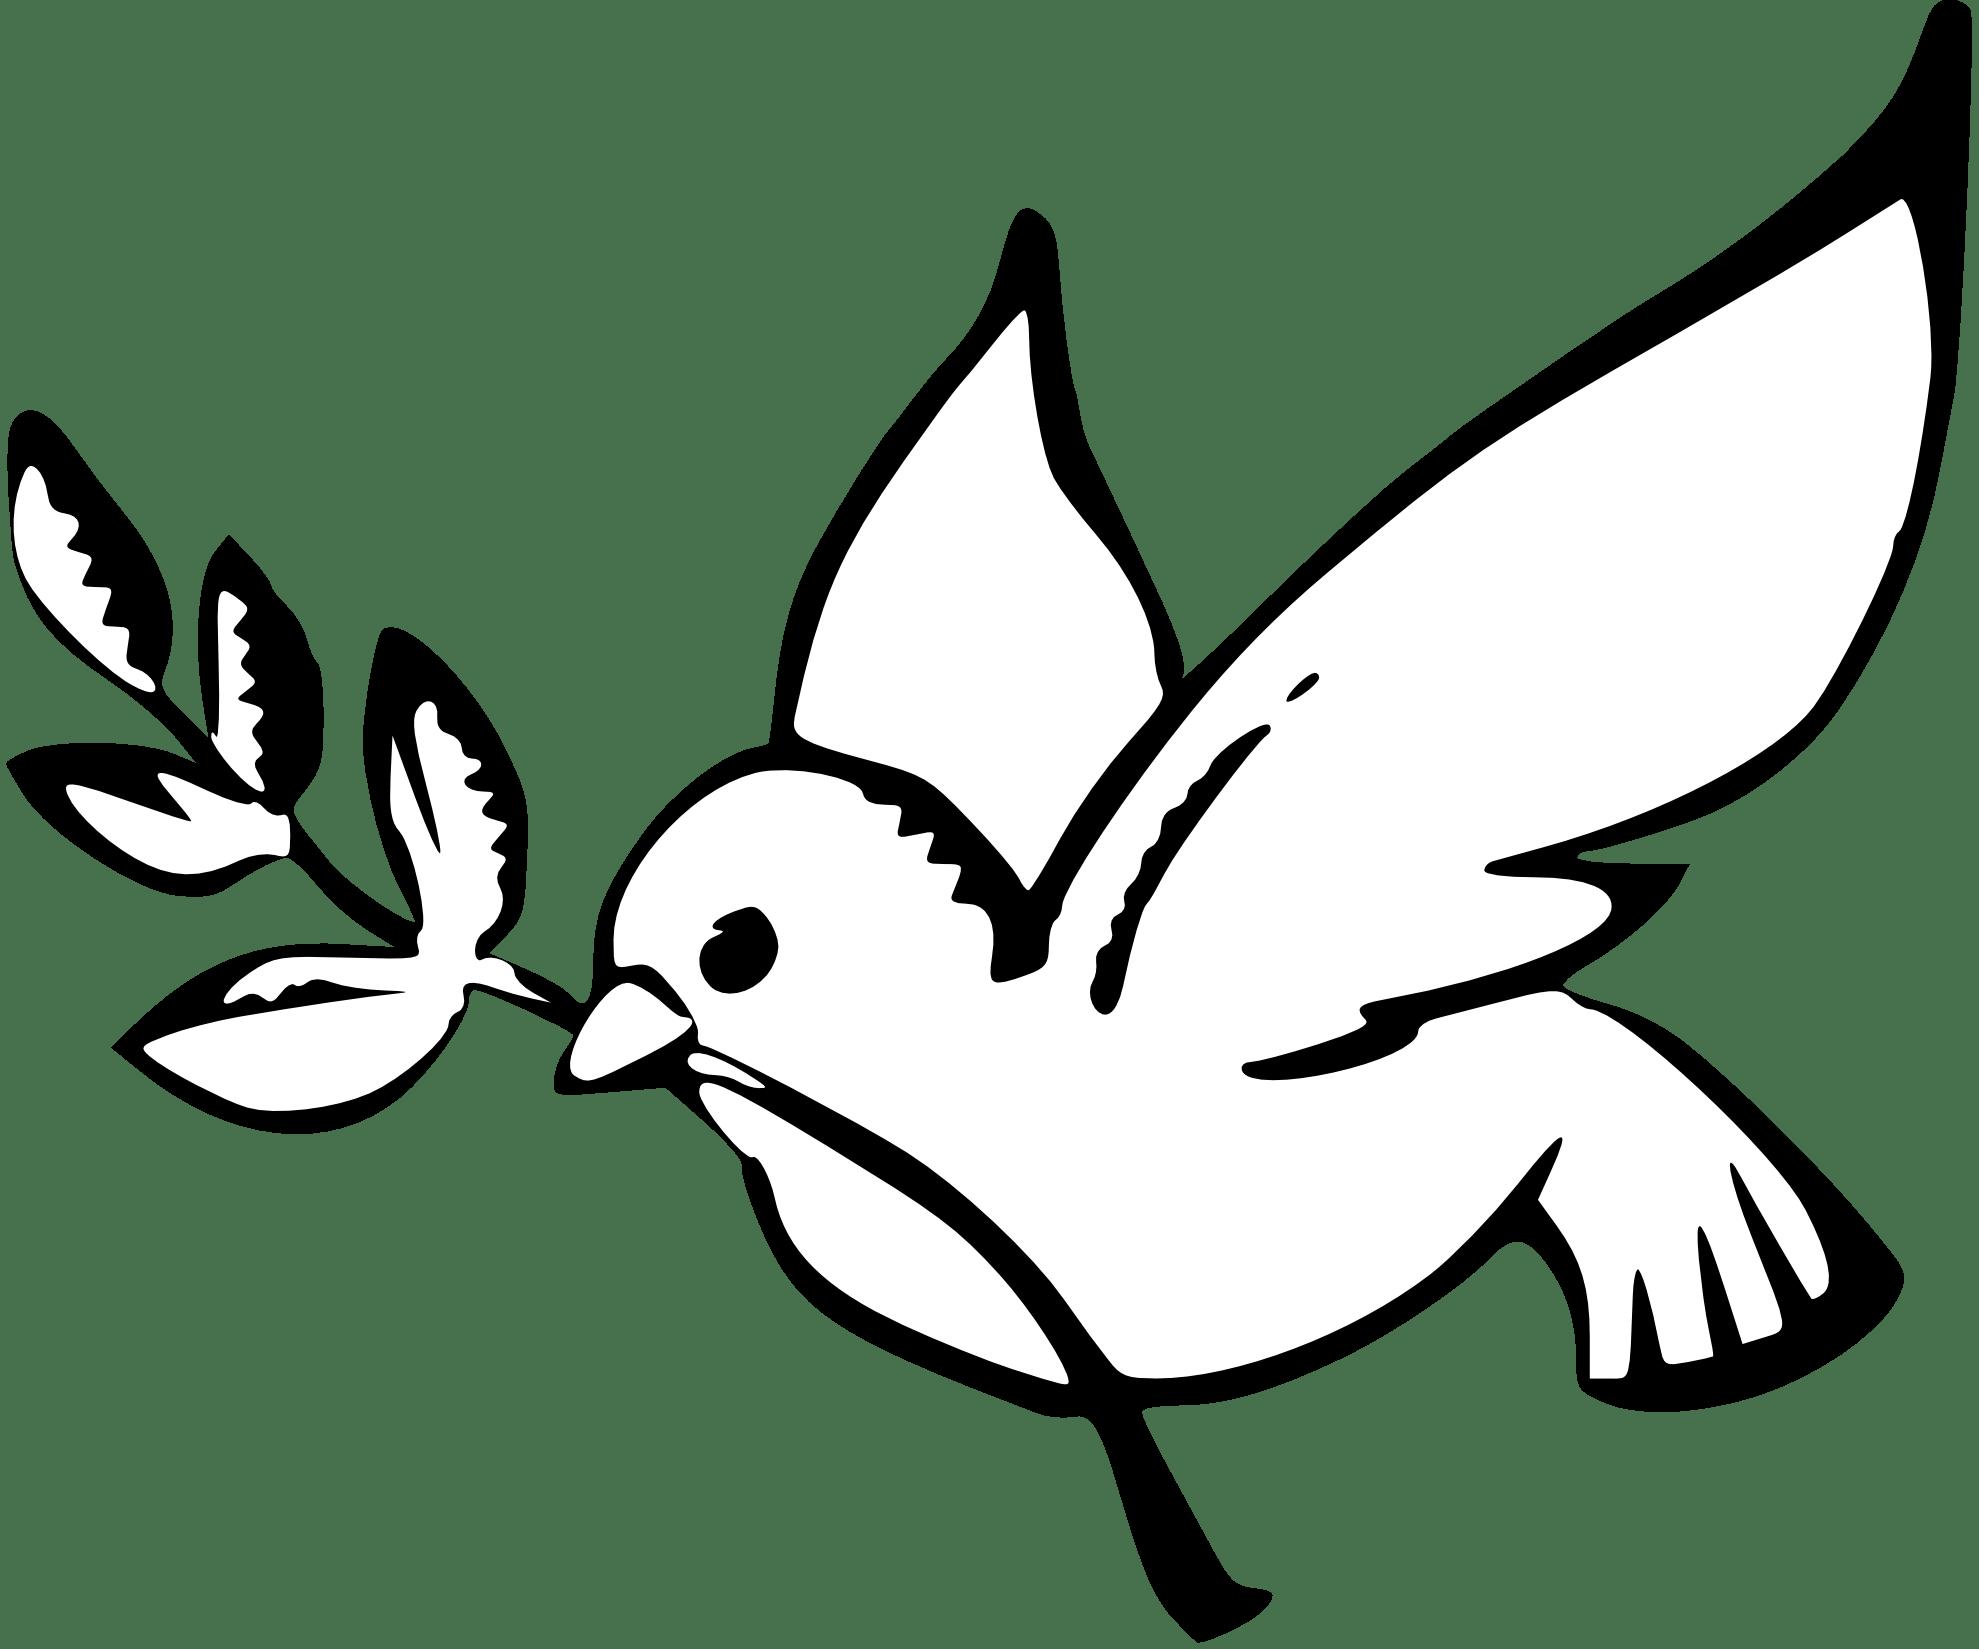 Dove Peace Black White Clipart Panda